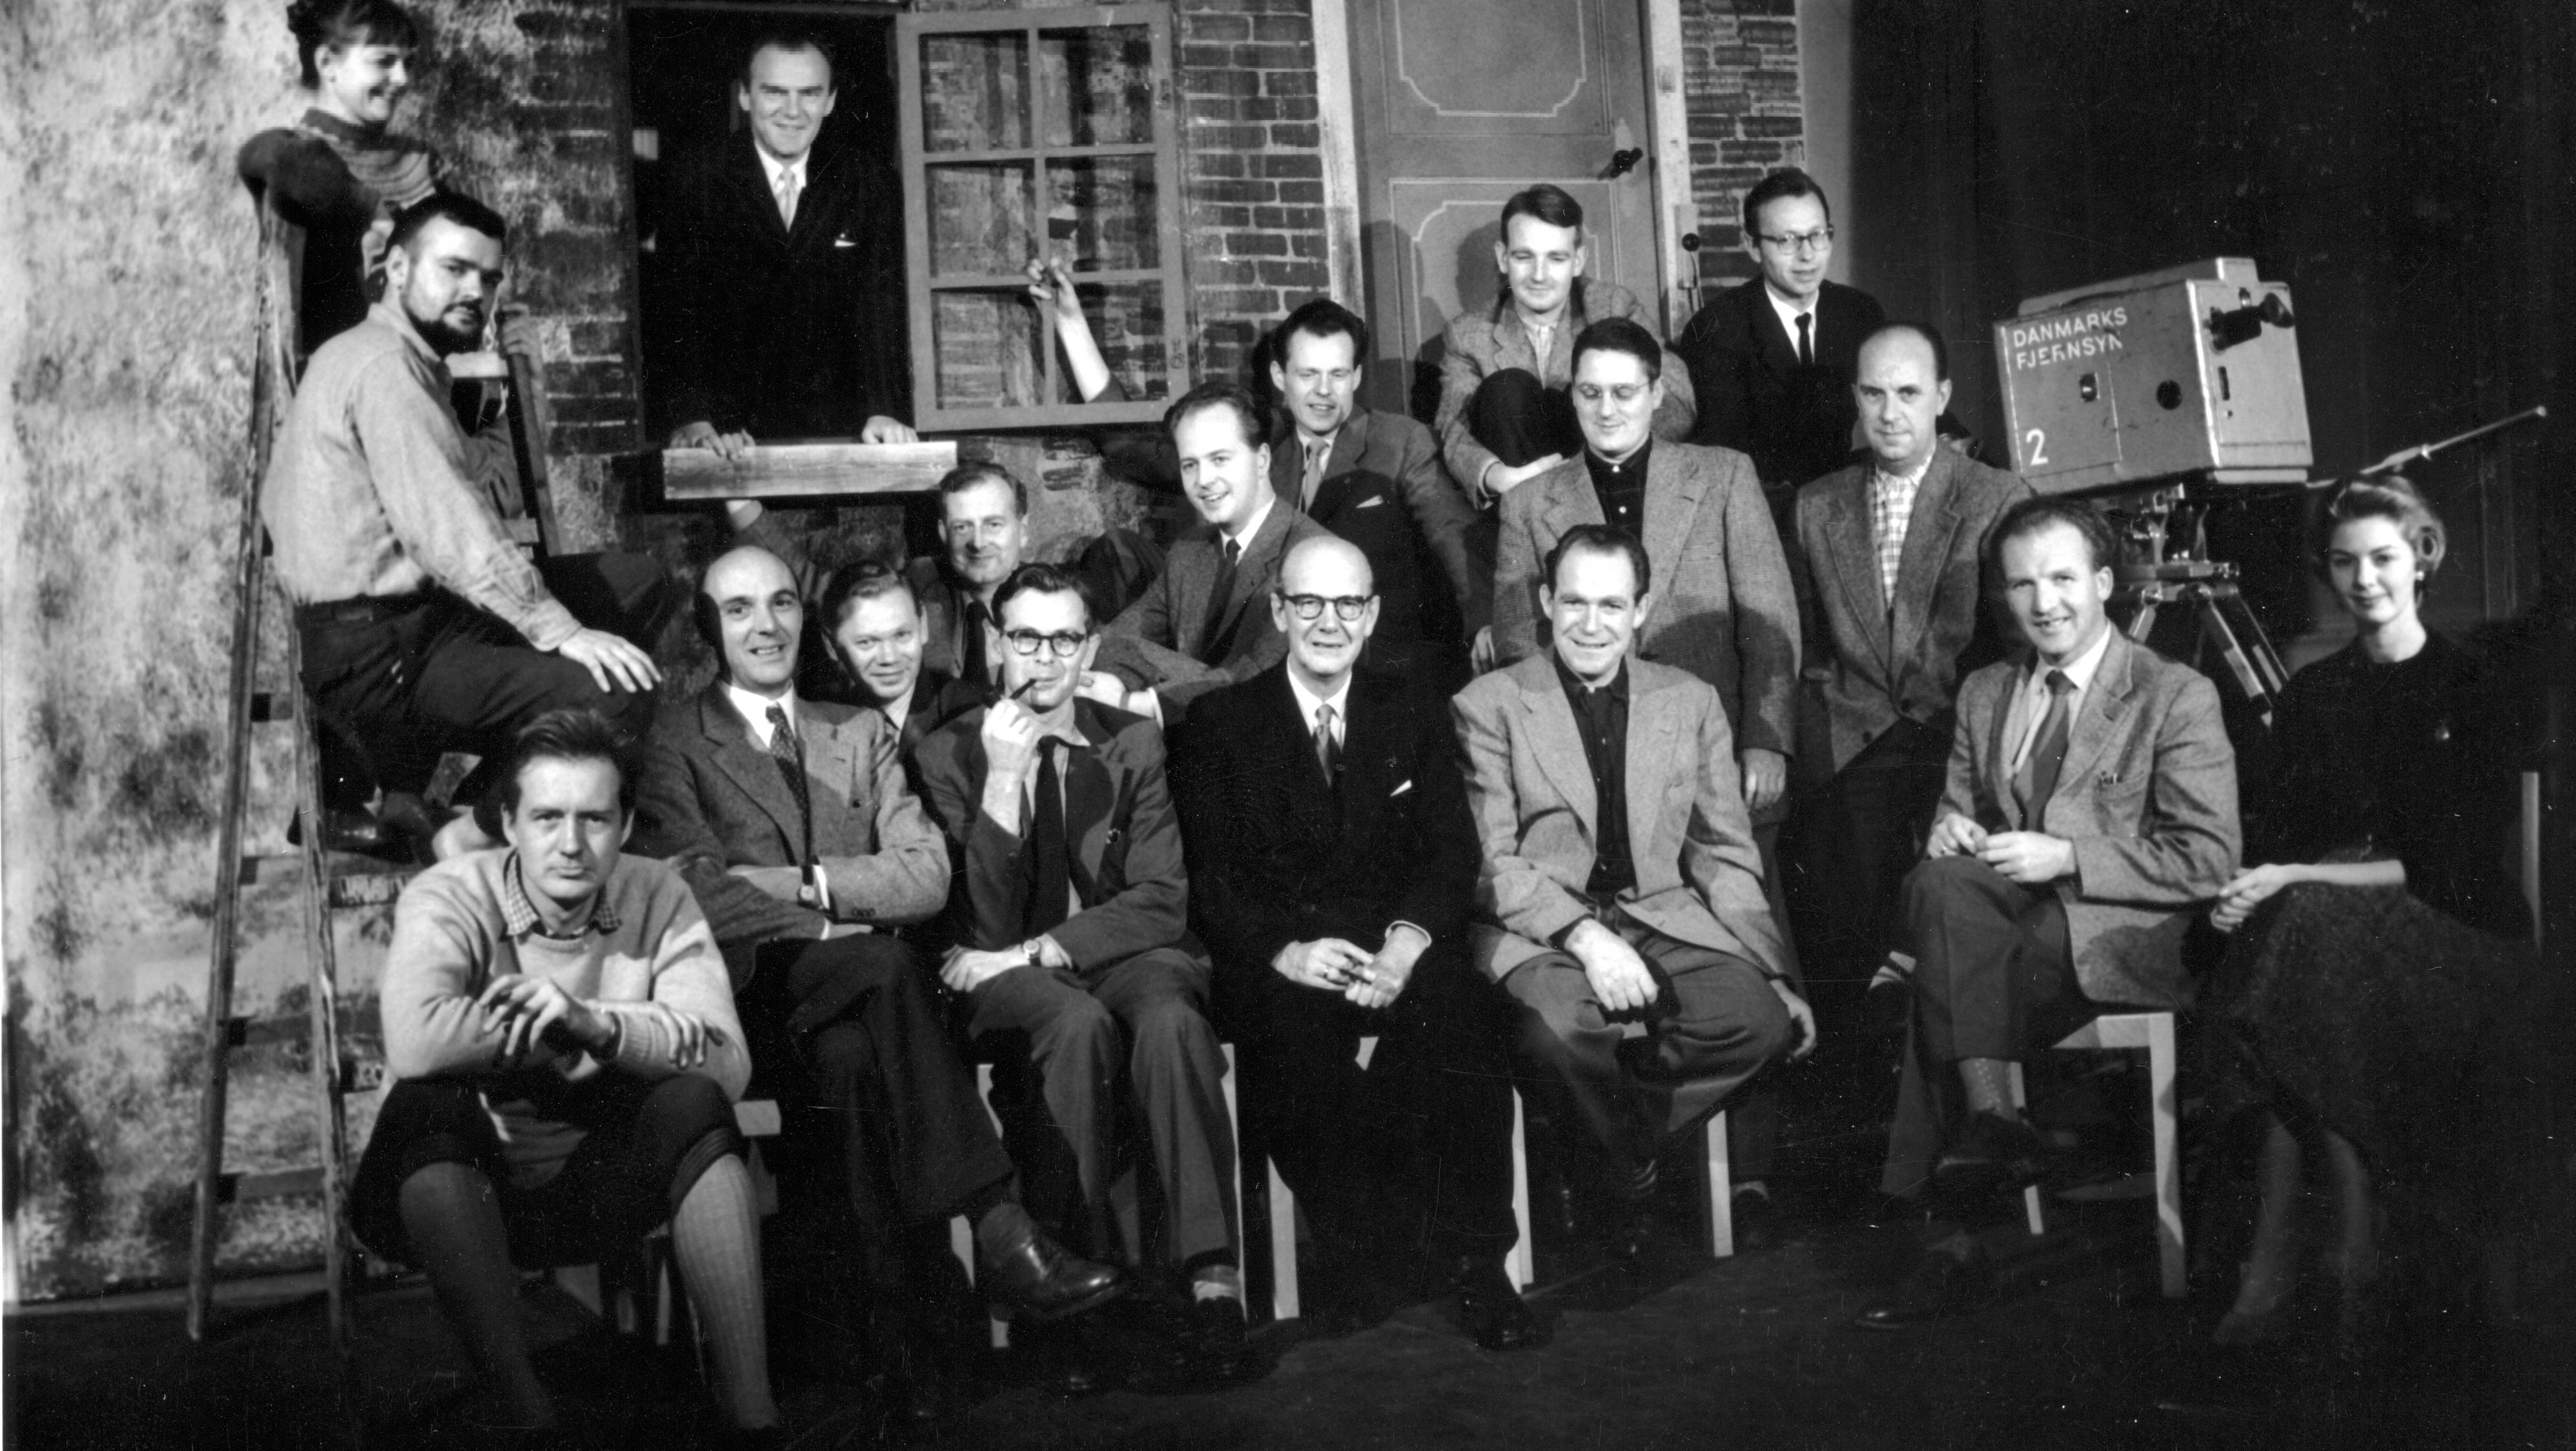 1940._holdet_der_starter_dansk_fjernsyn.jpg